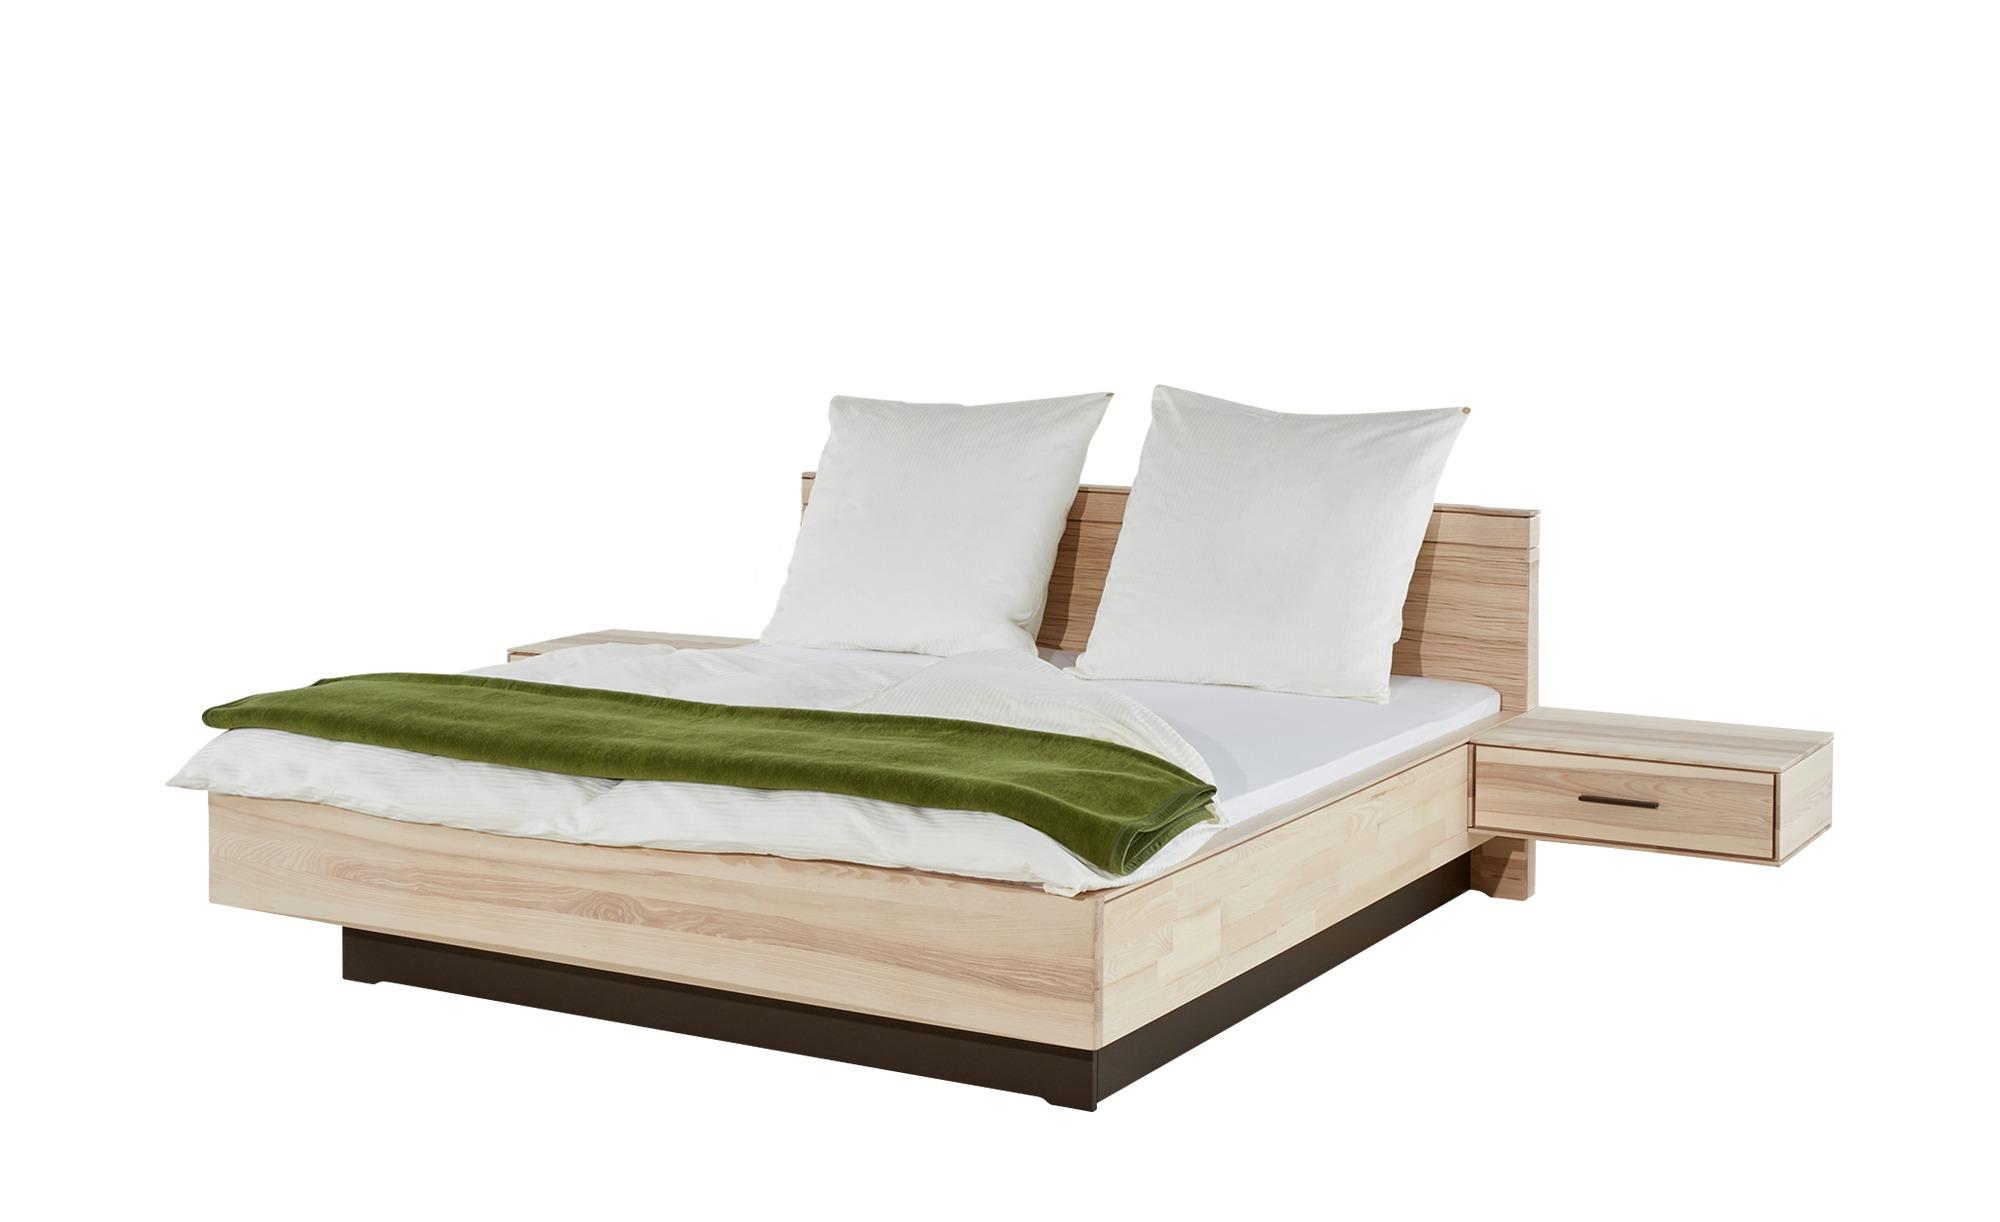 massivholz doppelbett mit nachtkonsolen kiruna breite 191 cm h he 86 cm holzfarben online. Black Bedroom Furniture Sets. Home Design Ideas